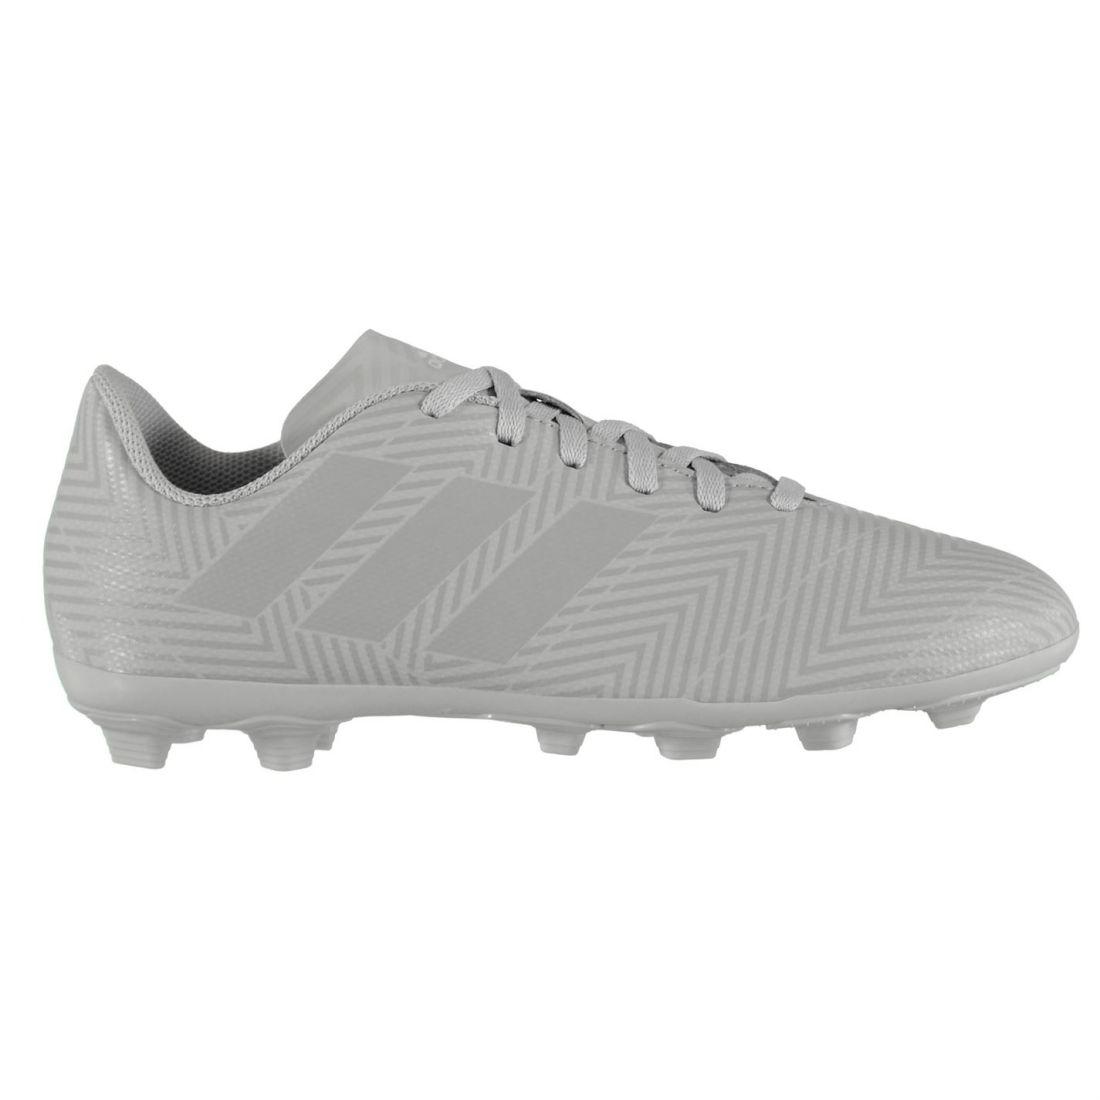 b89857889 Adidas Kids Boys Nemziz 18.4 FG Junior Football Boots Firm Ground ...